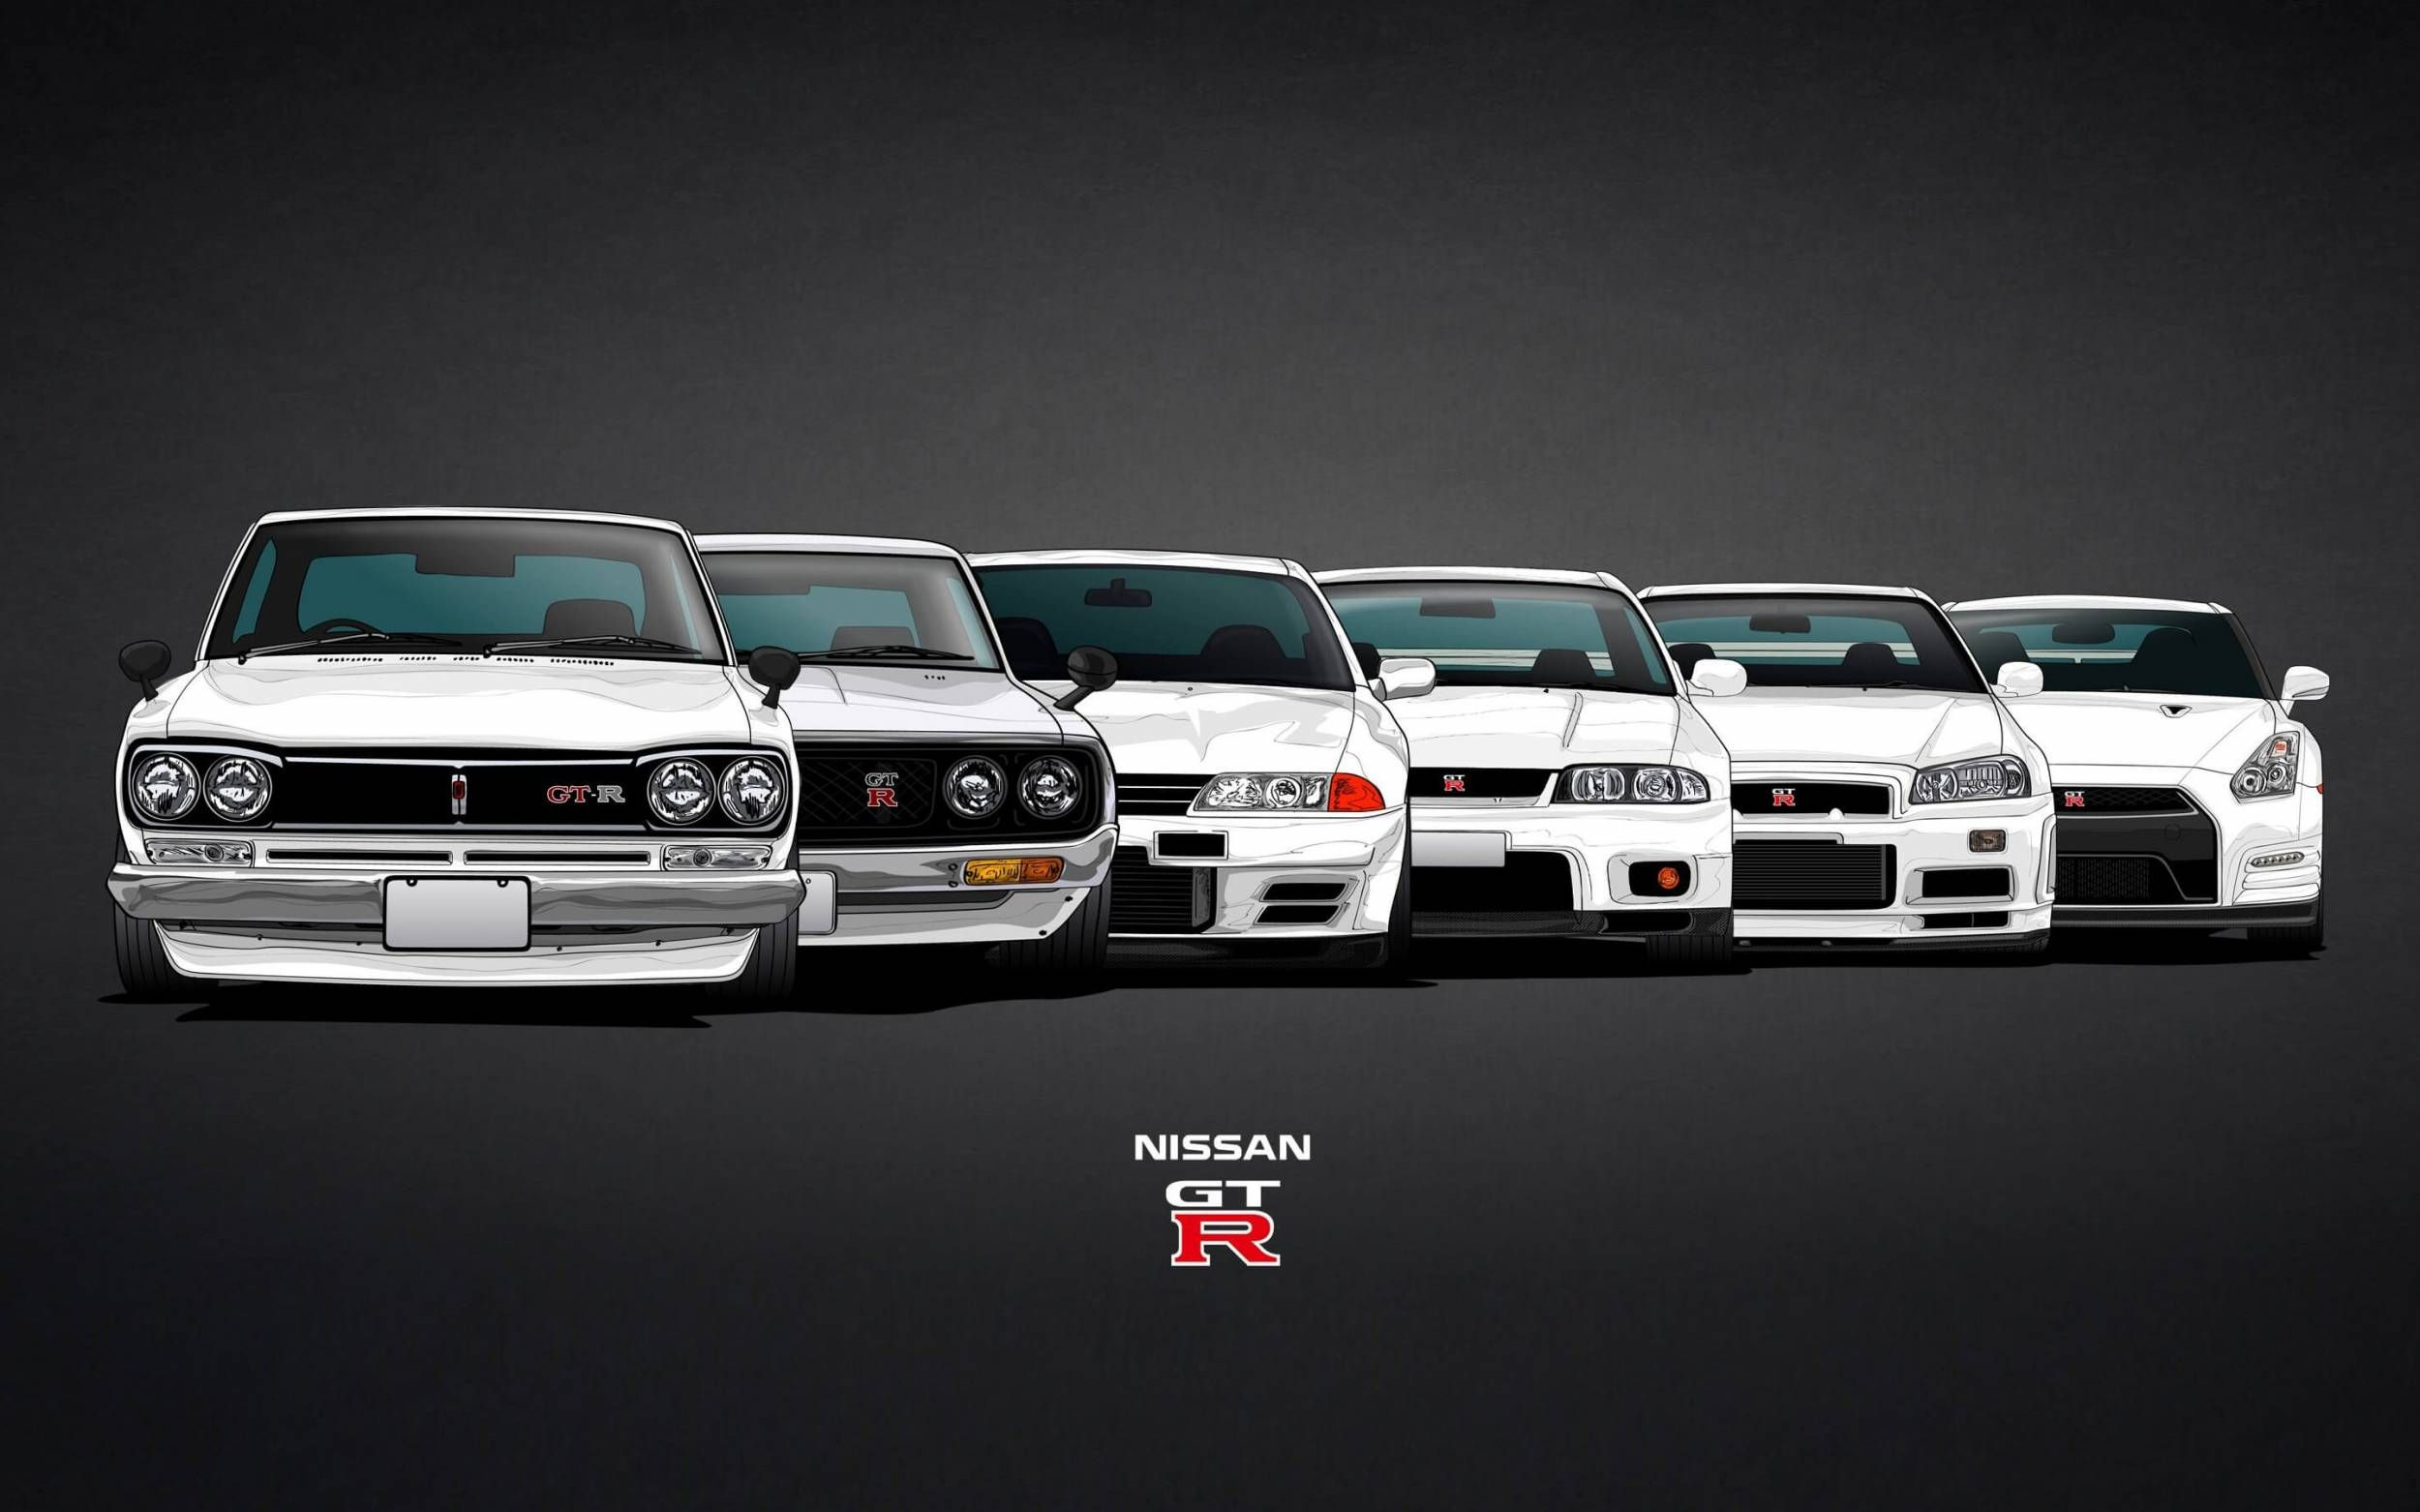 Nissan Skyline Wallpapers Top Free Nissan Skyline Backgrounds Wallpaperaccess